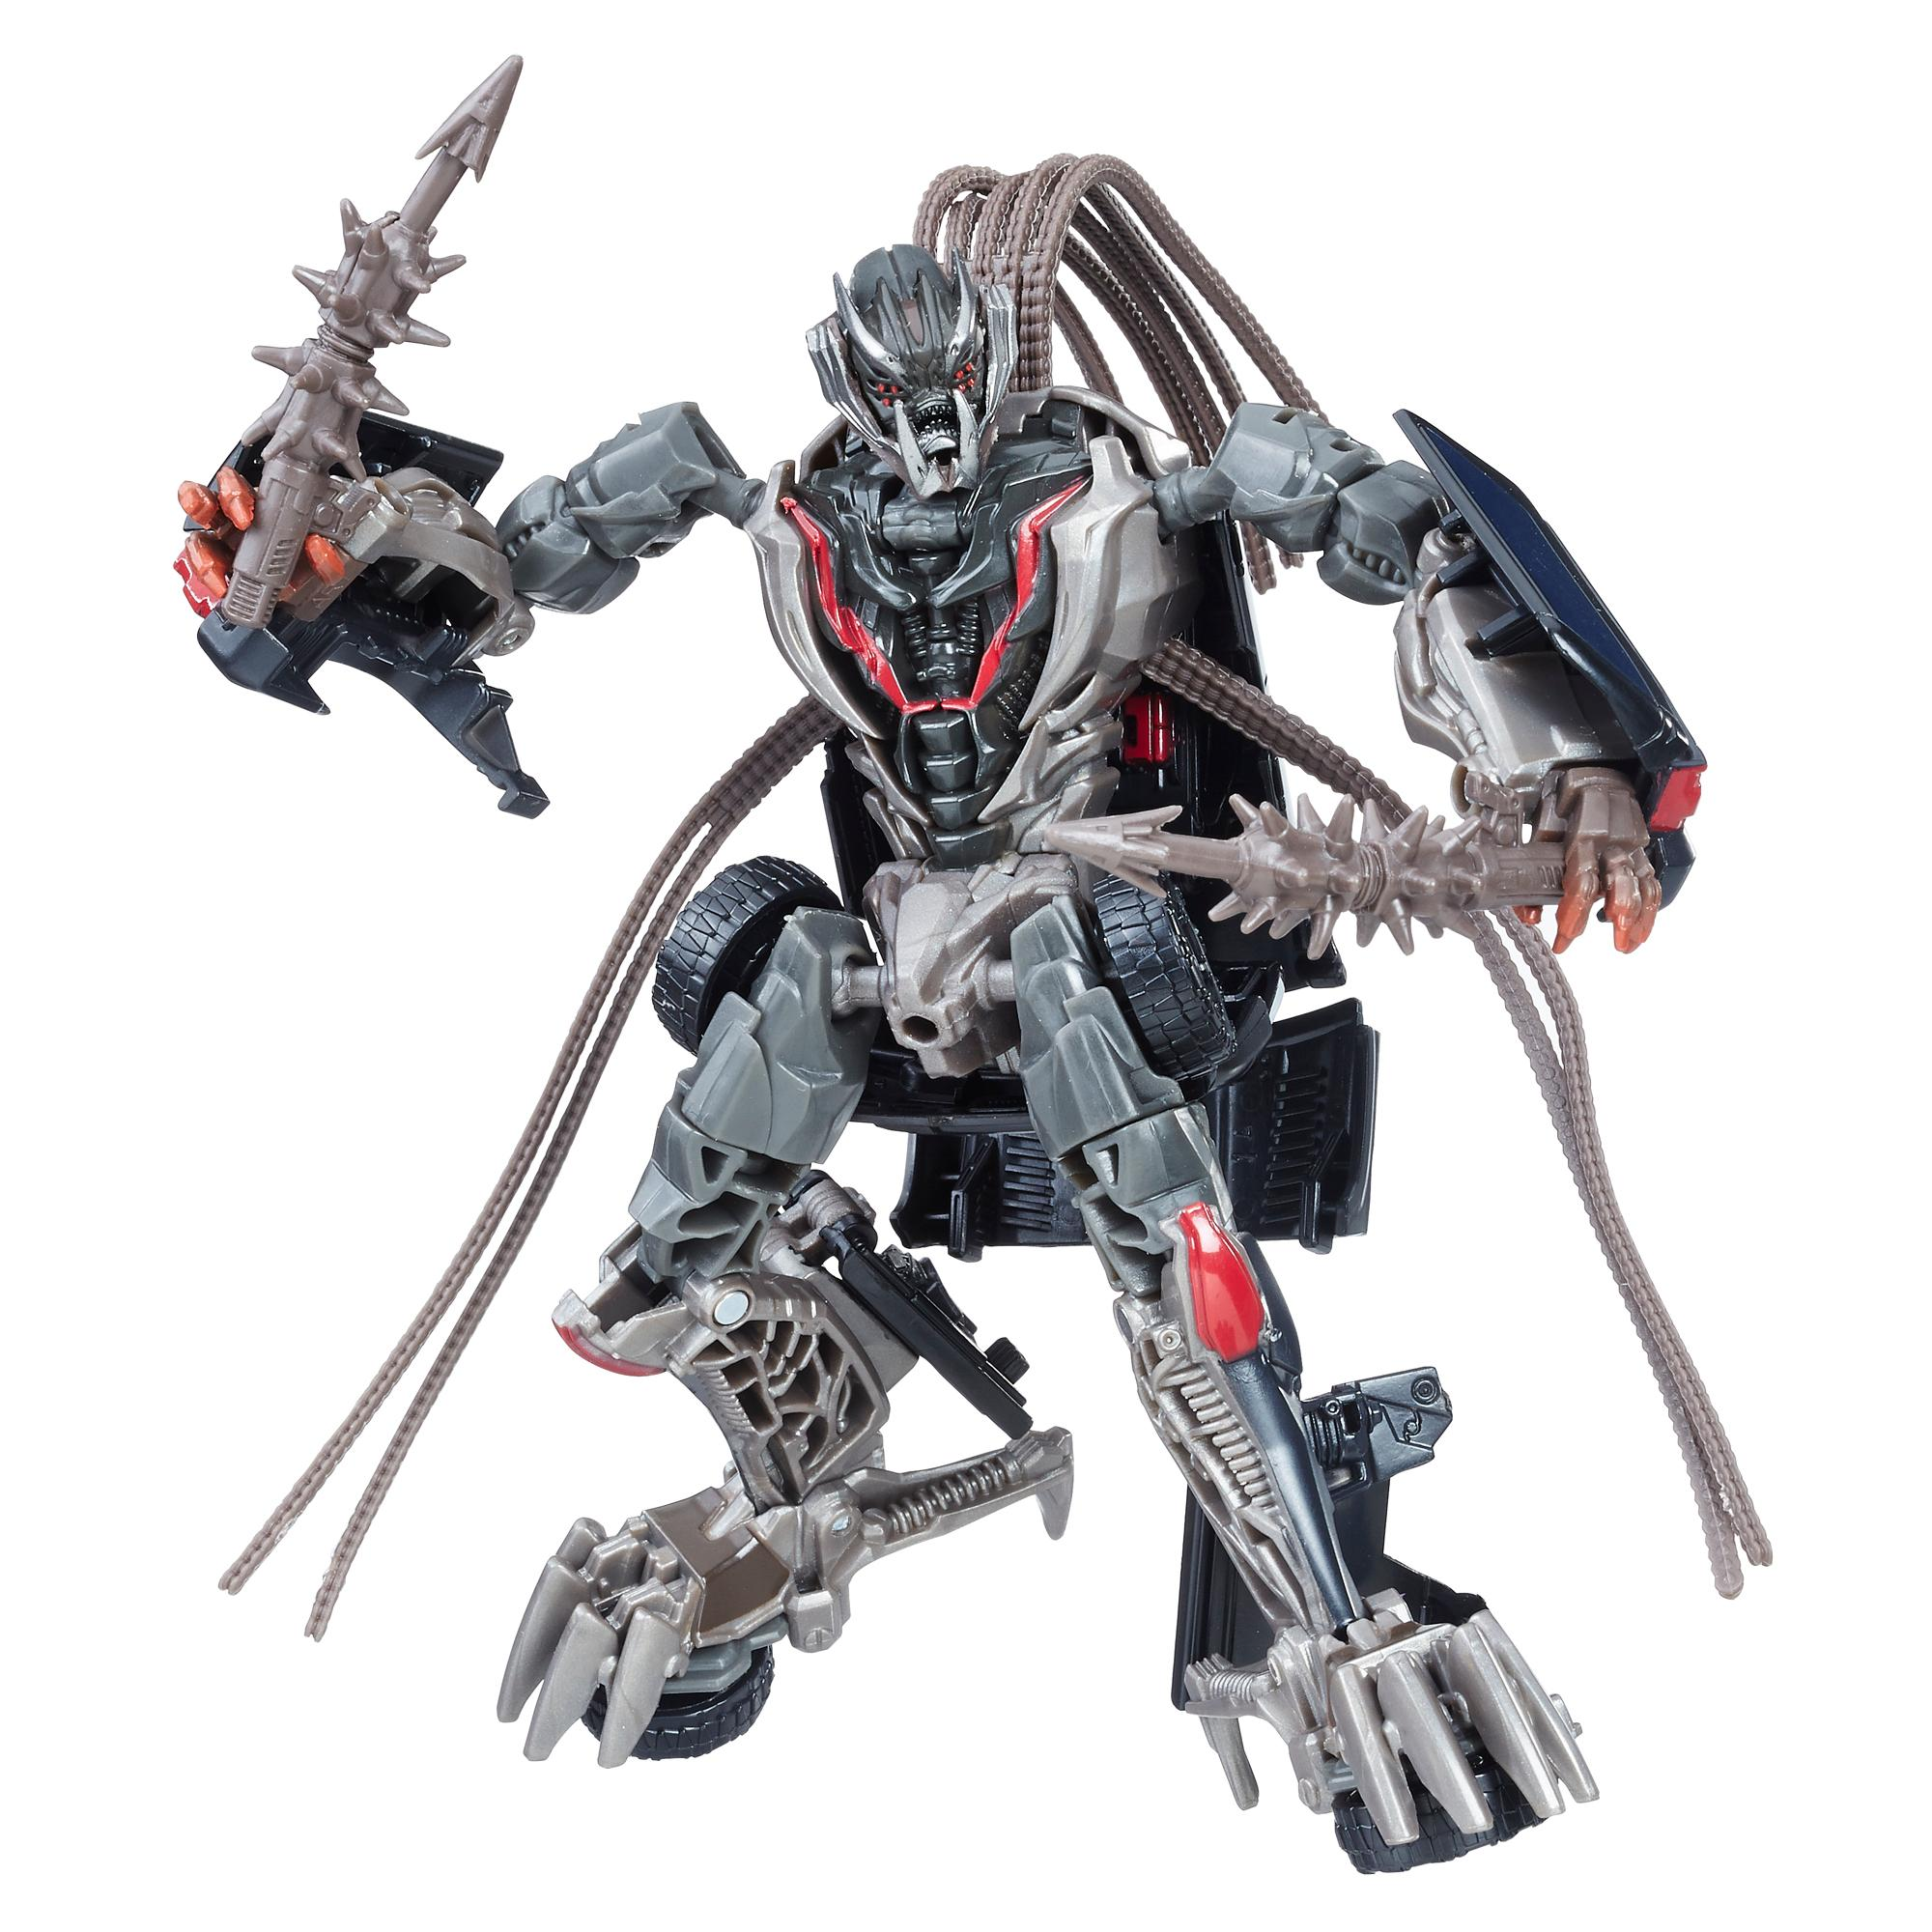 Transformers Studio Series 03 Deluxe Class Movie 3 Crowbar